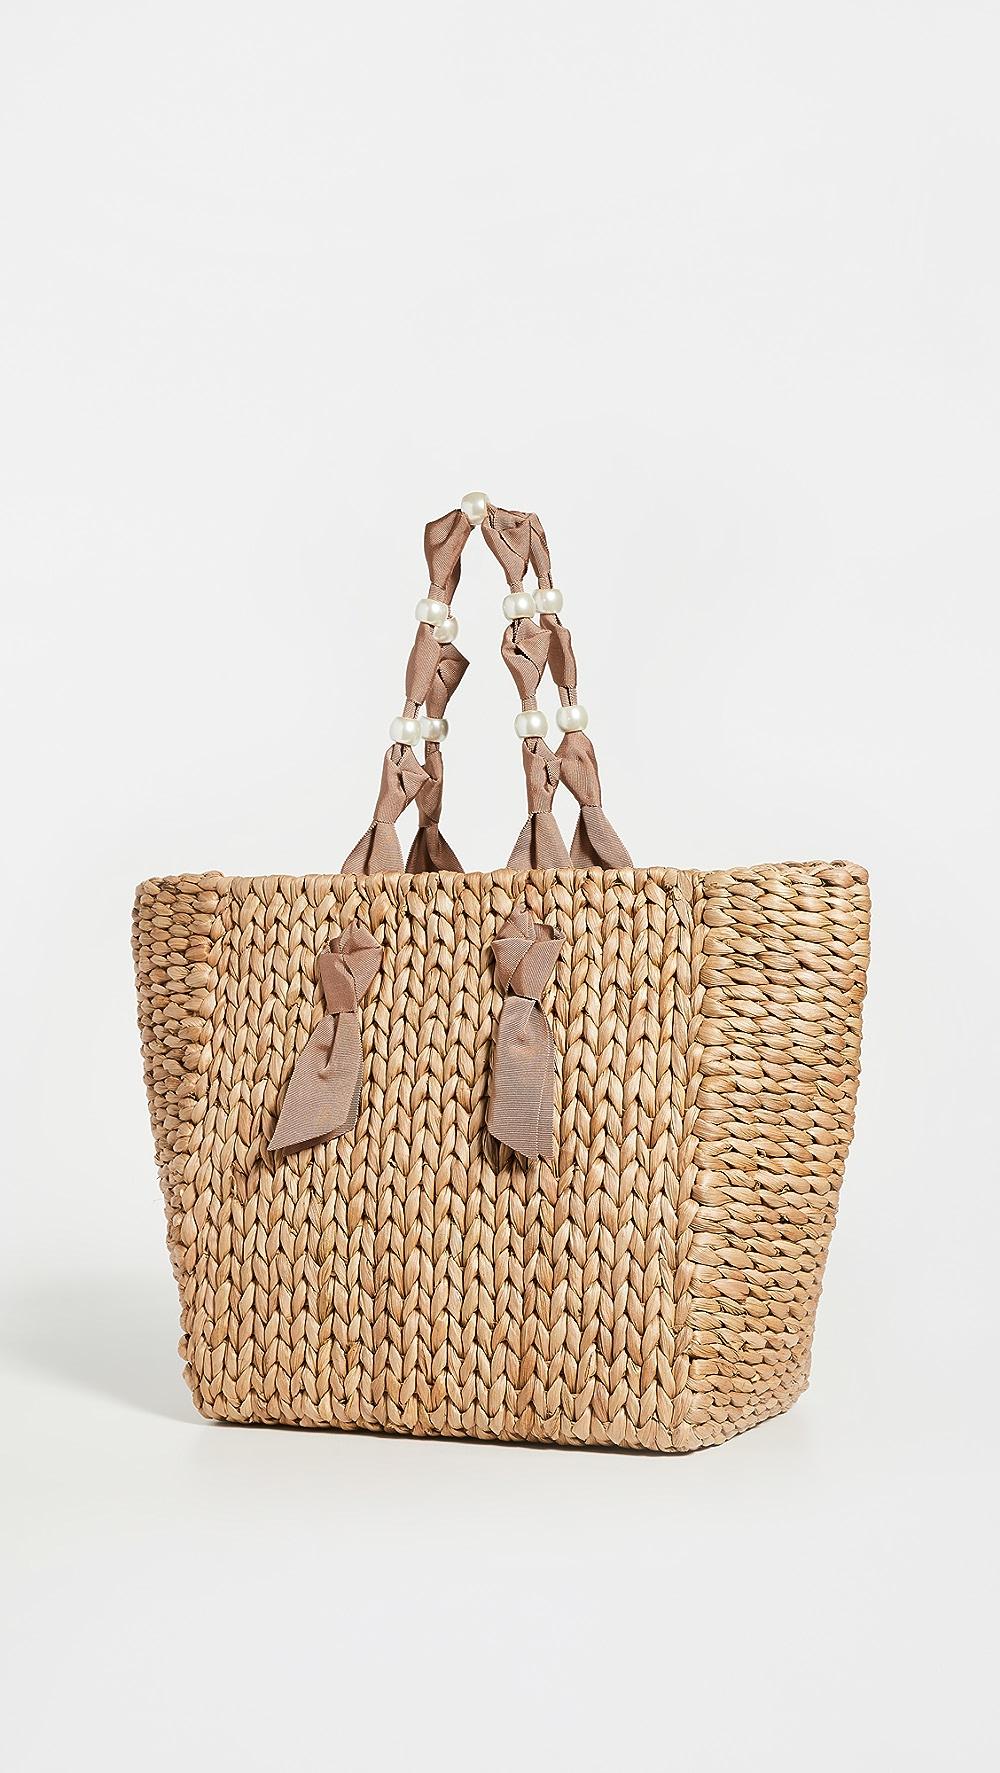 Efficient Pamela Munson - Isla Bahia Bag Latest Technology